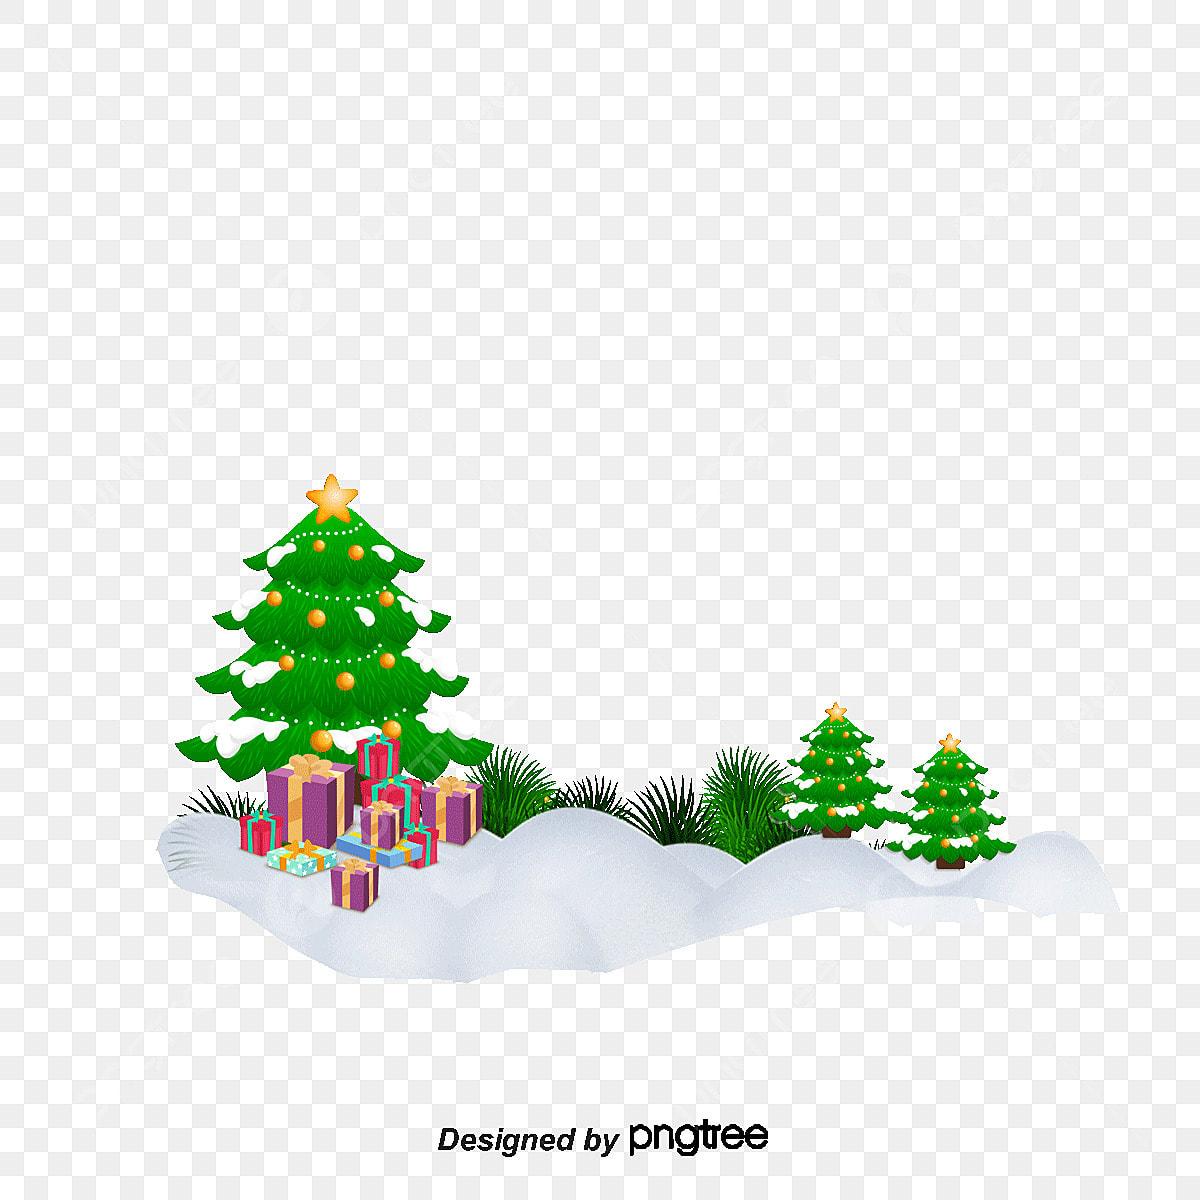 Gambar Pohon Natal Kartun Hitam Putih